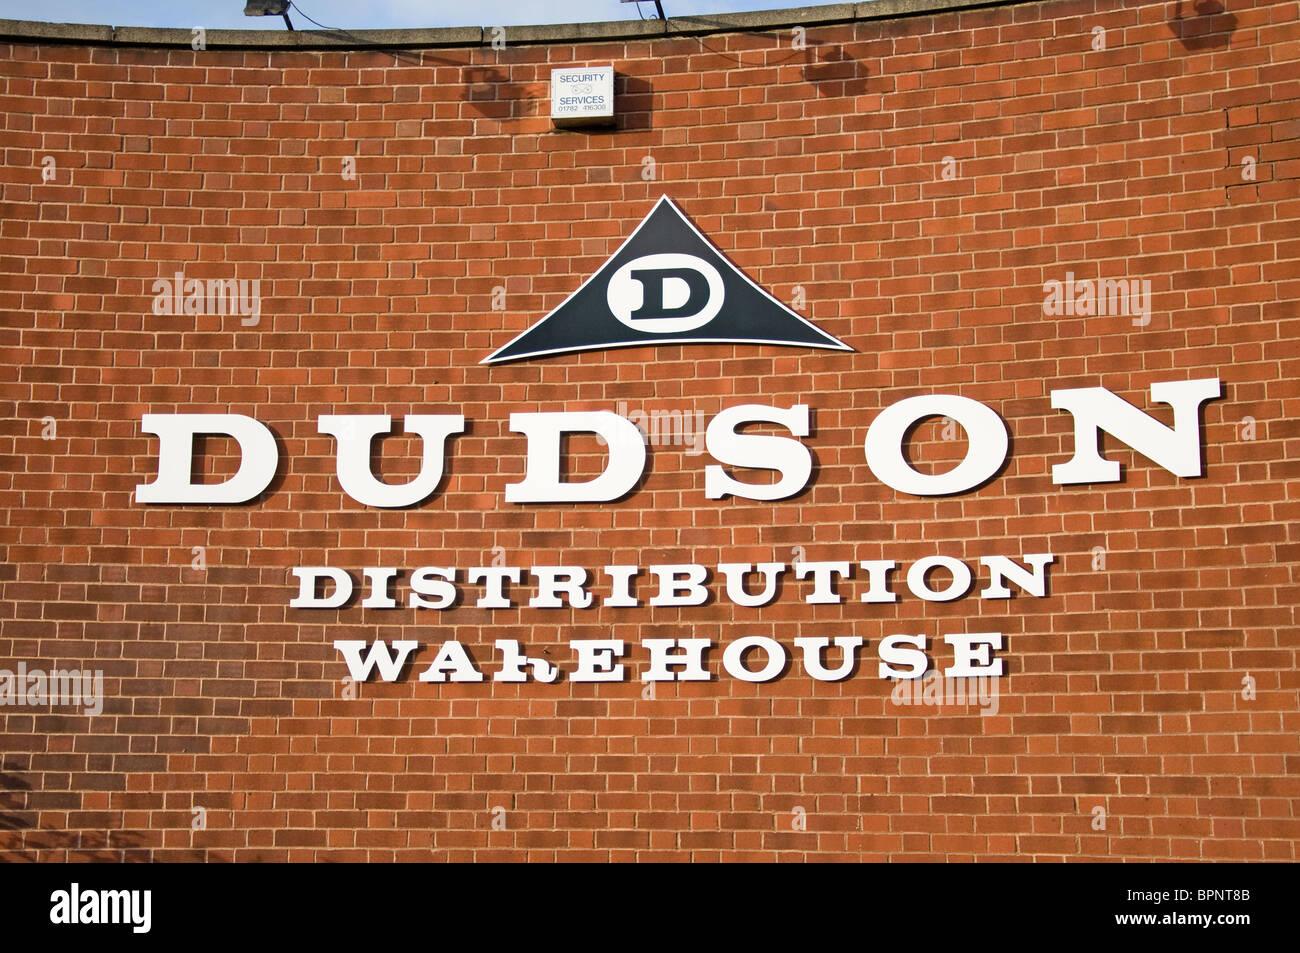 Entrepôt de distribution Dudson signe sur mur, Burslem Stoke-on-Trent, Staffordshire, Royaume-Uni Photo Stock